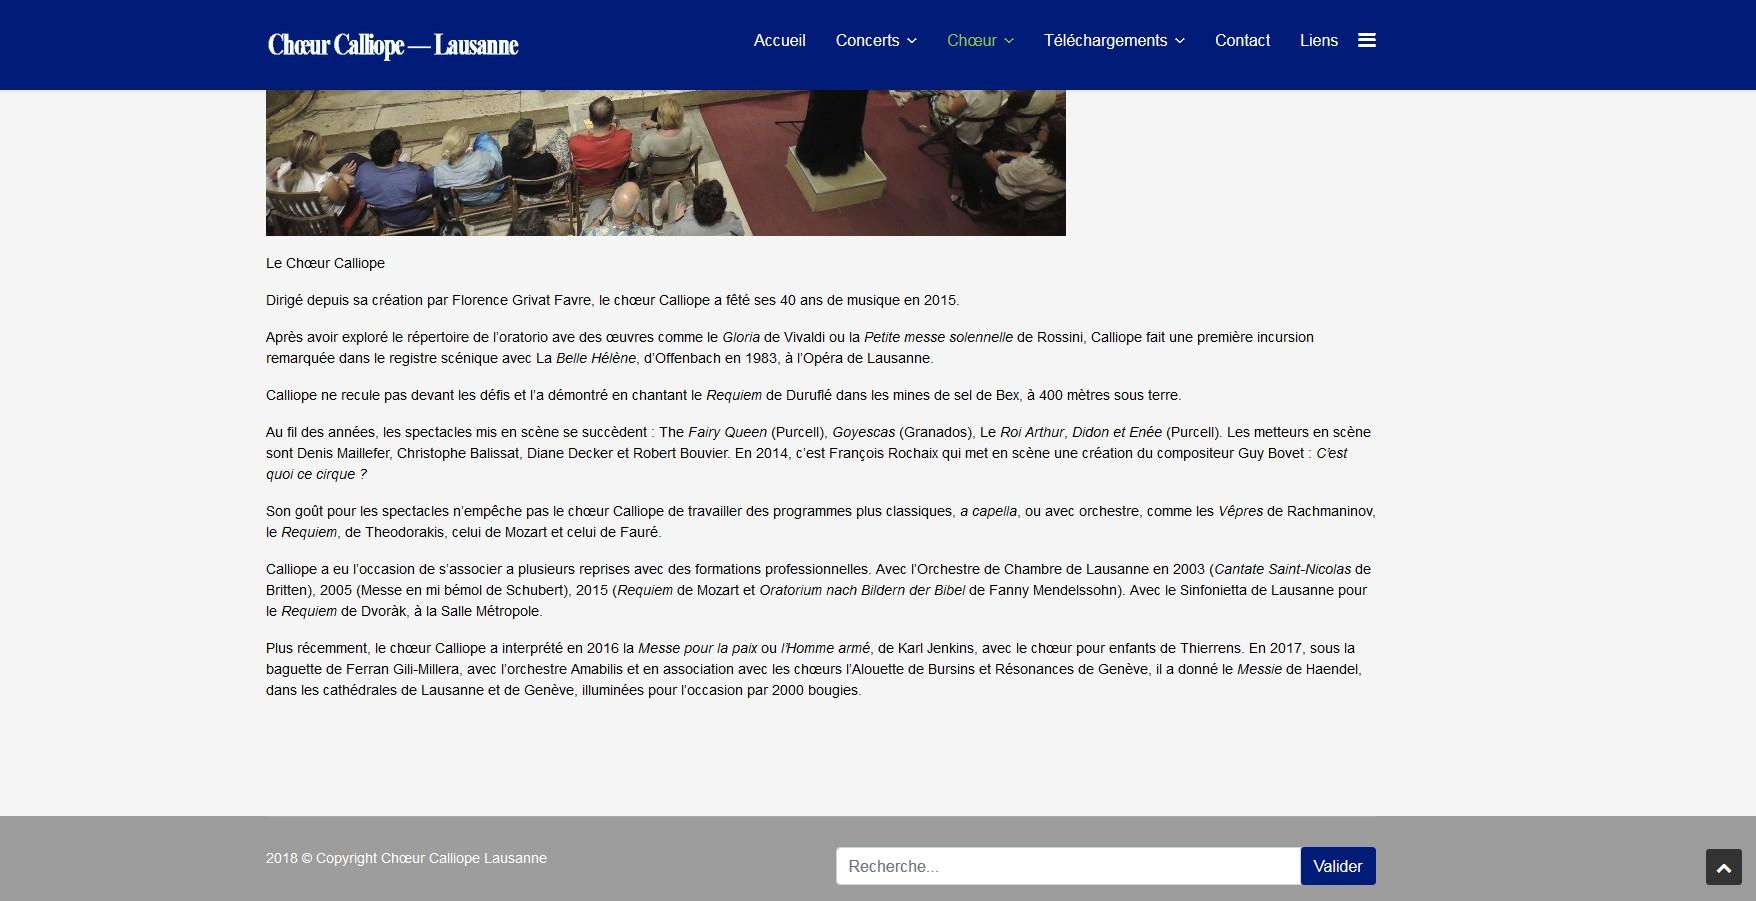 Edocman2-website_2019-01-07.jpg